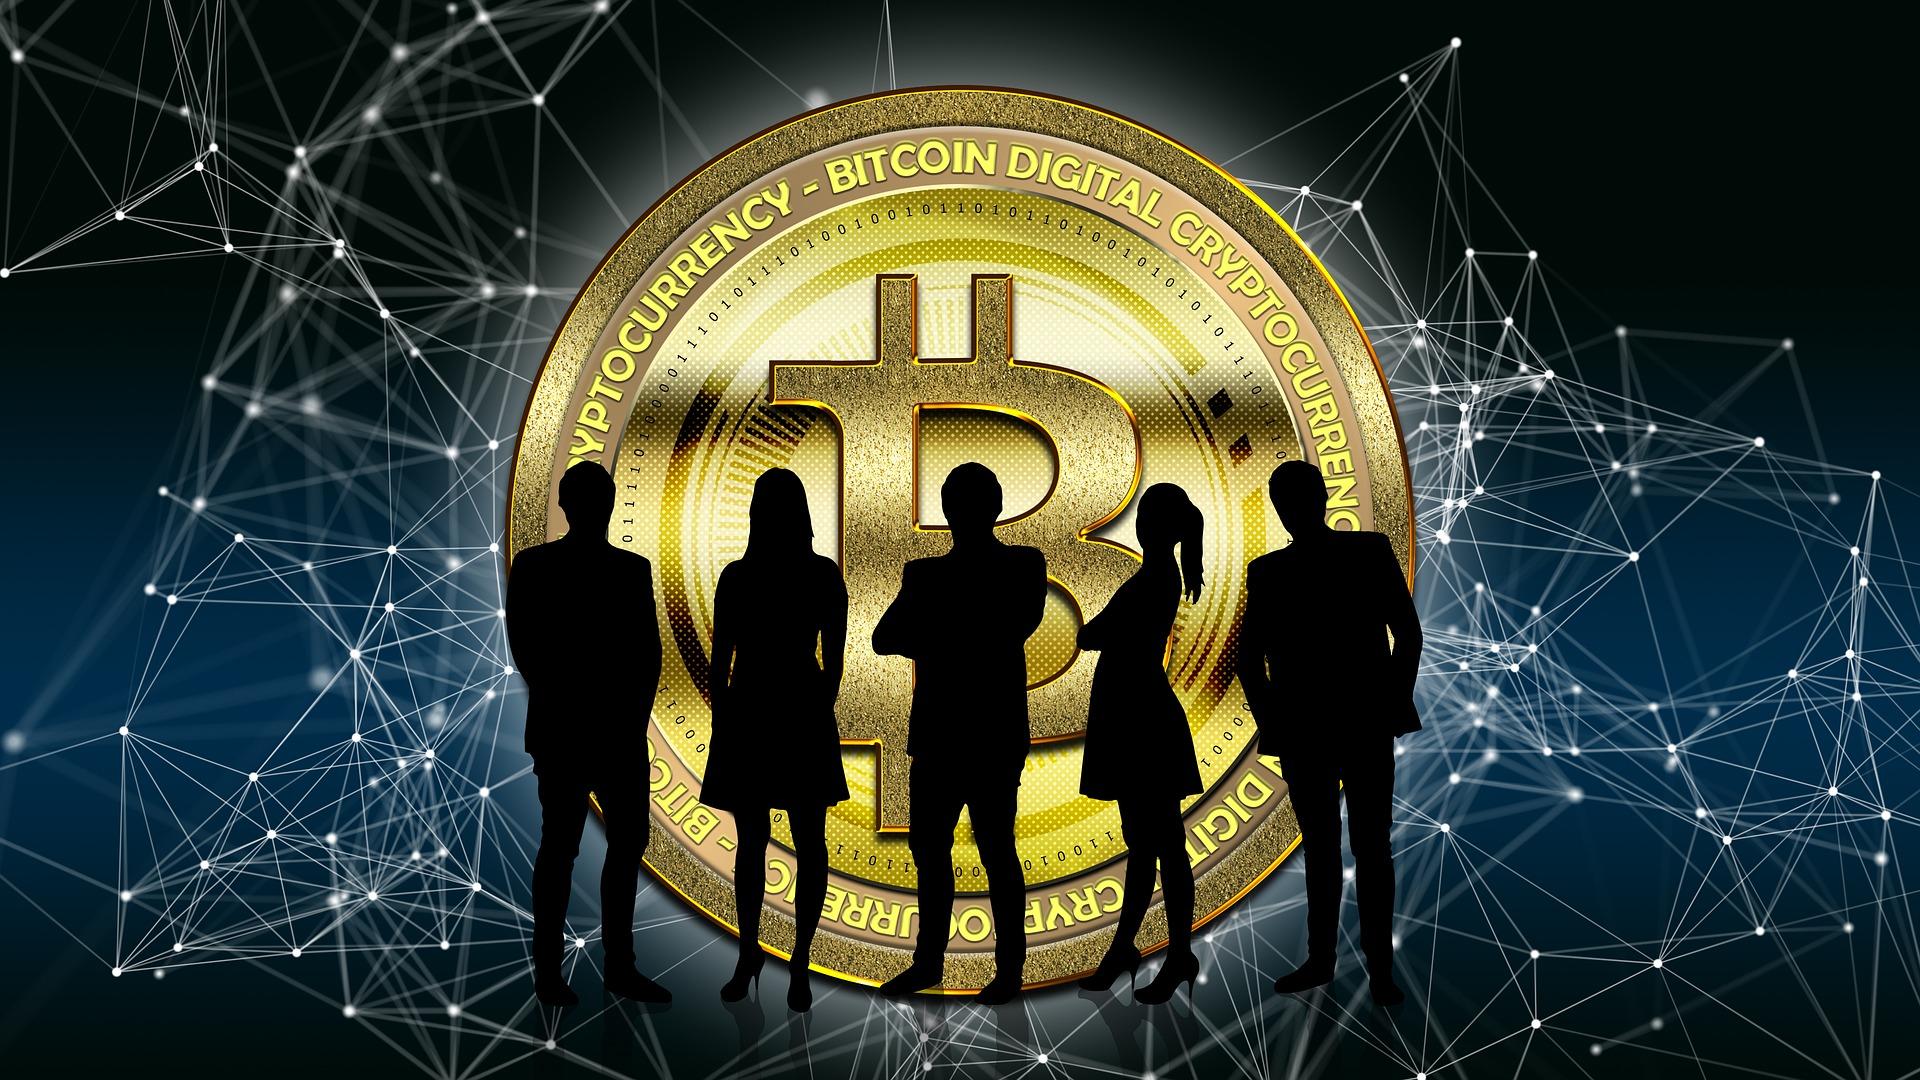 Oriontero online crypto broker review